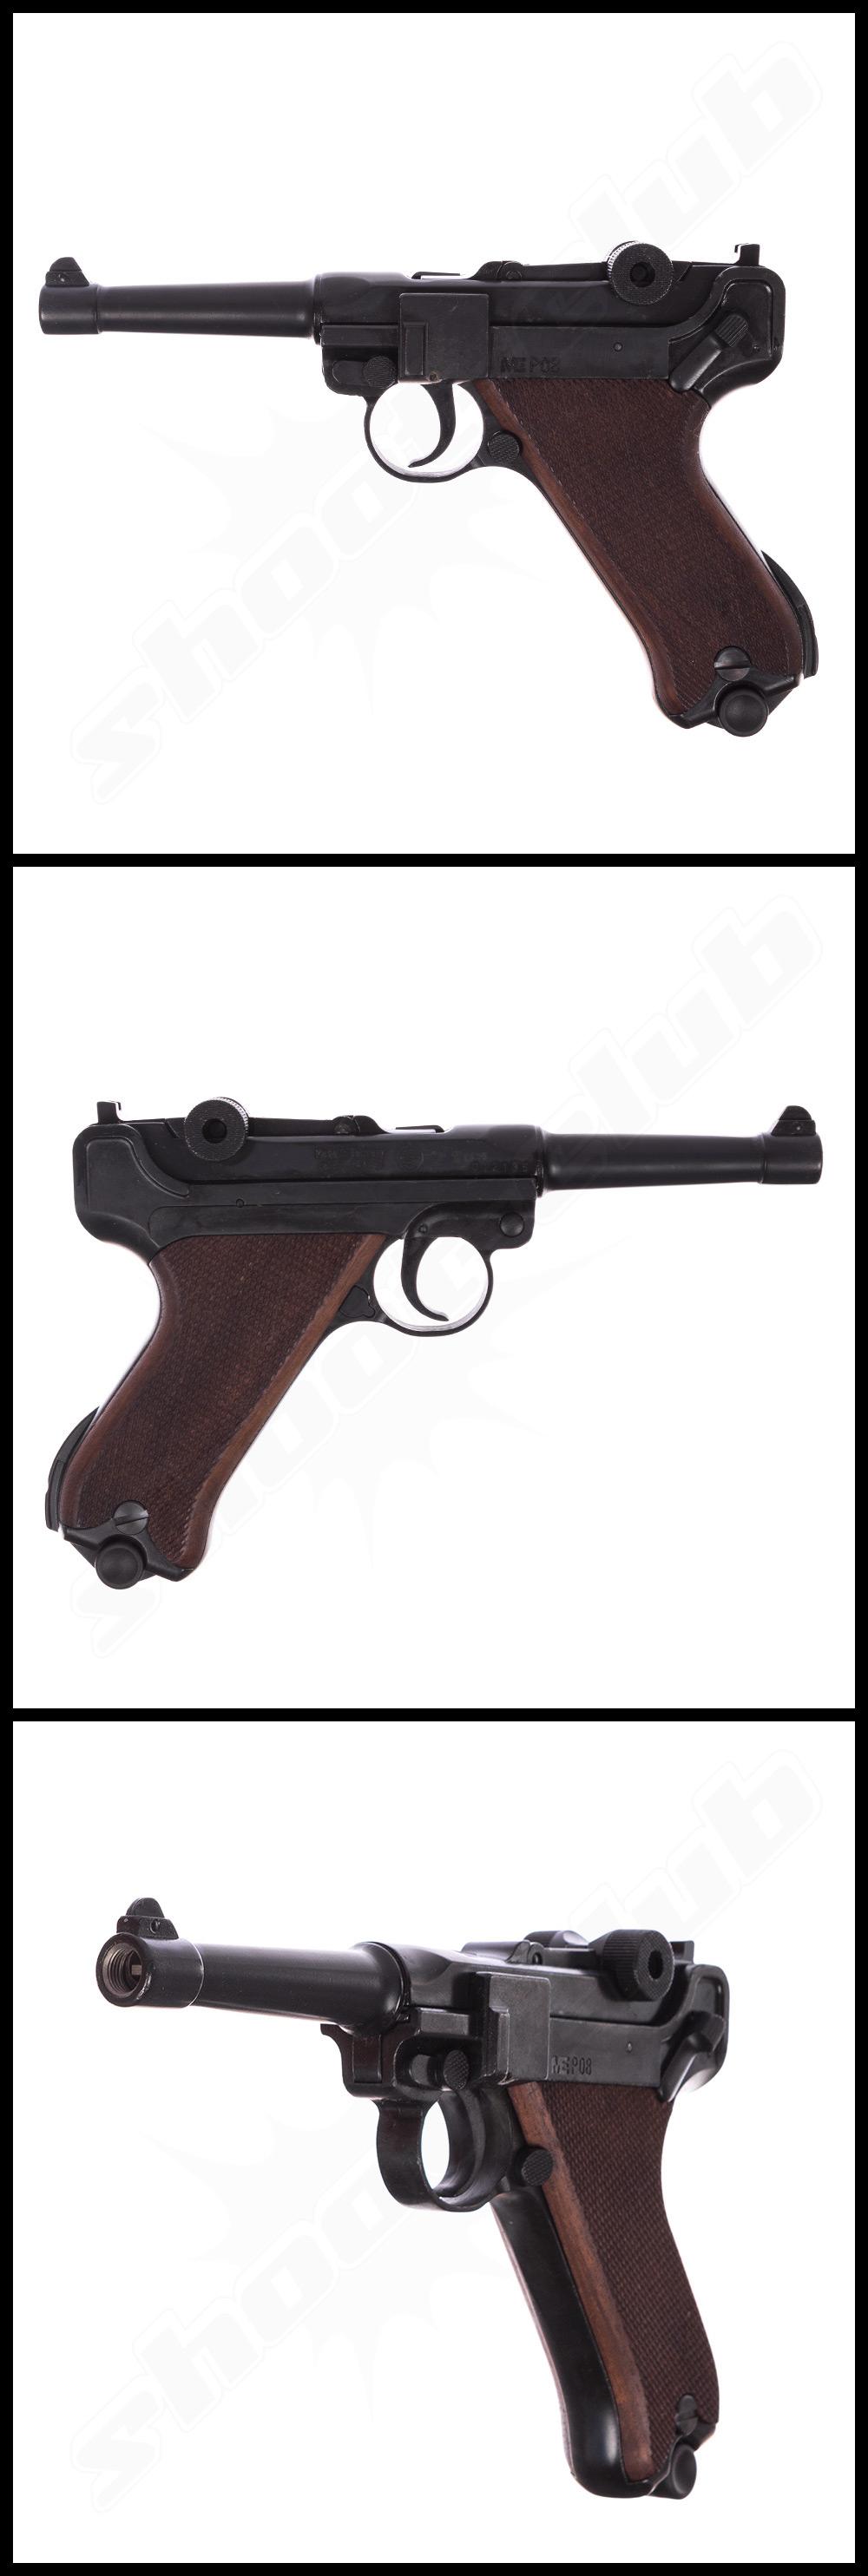 schreckschusspistole me luger modell p08 9mm p a k. Black Bedroom Furniture Sets. Home Design Ideas